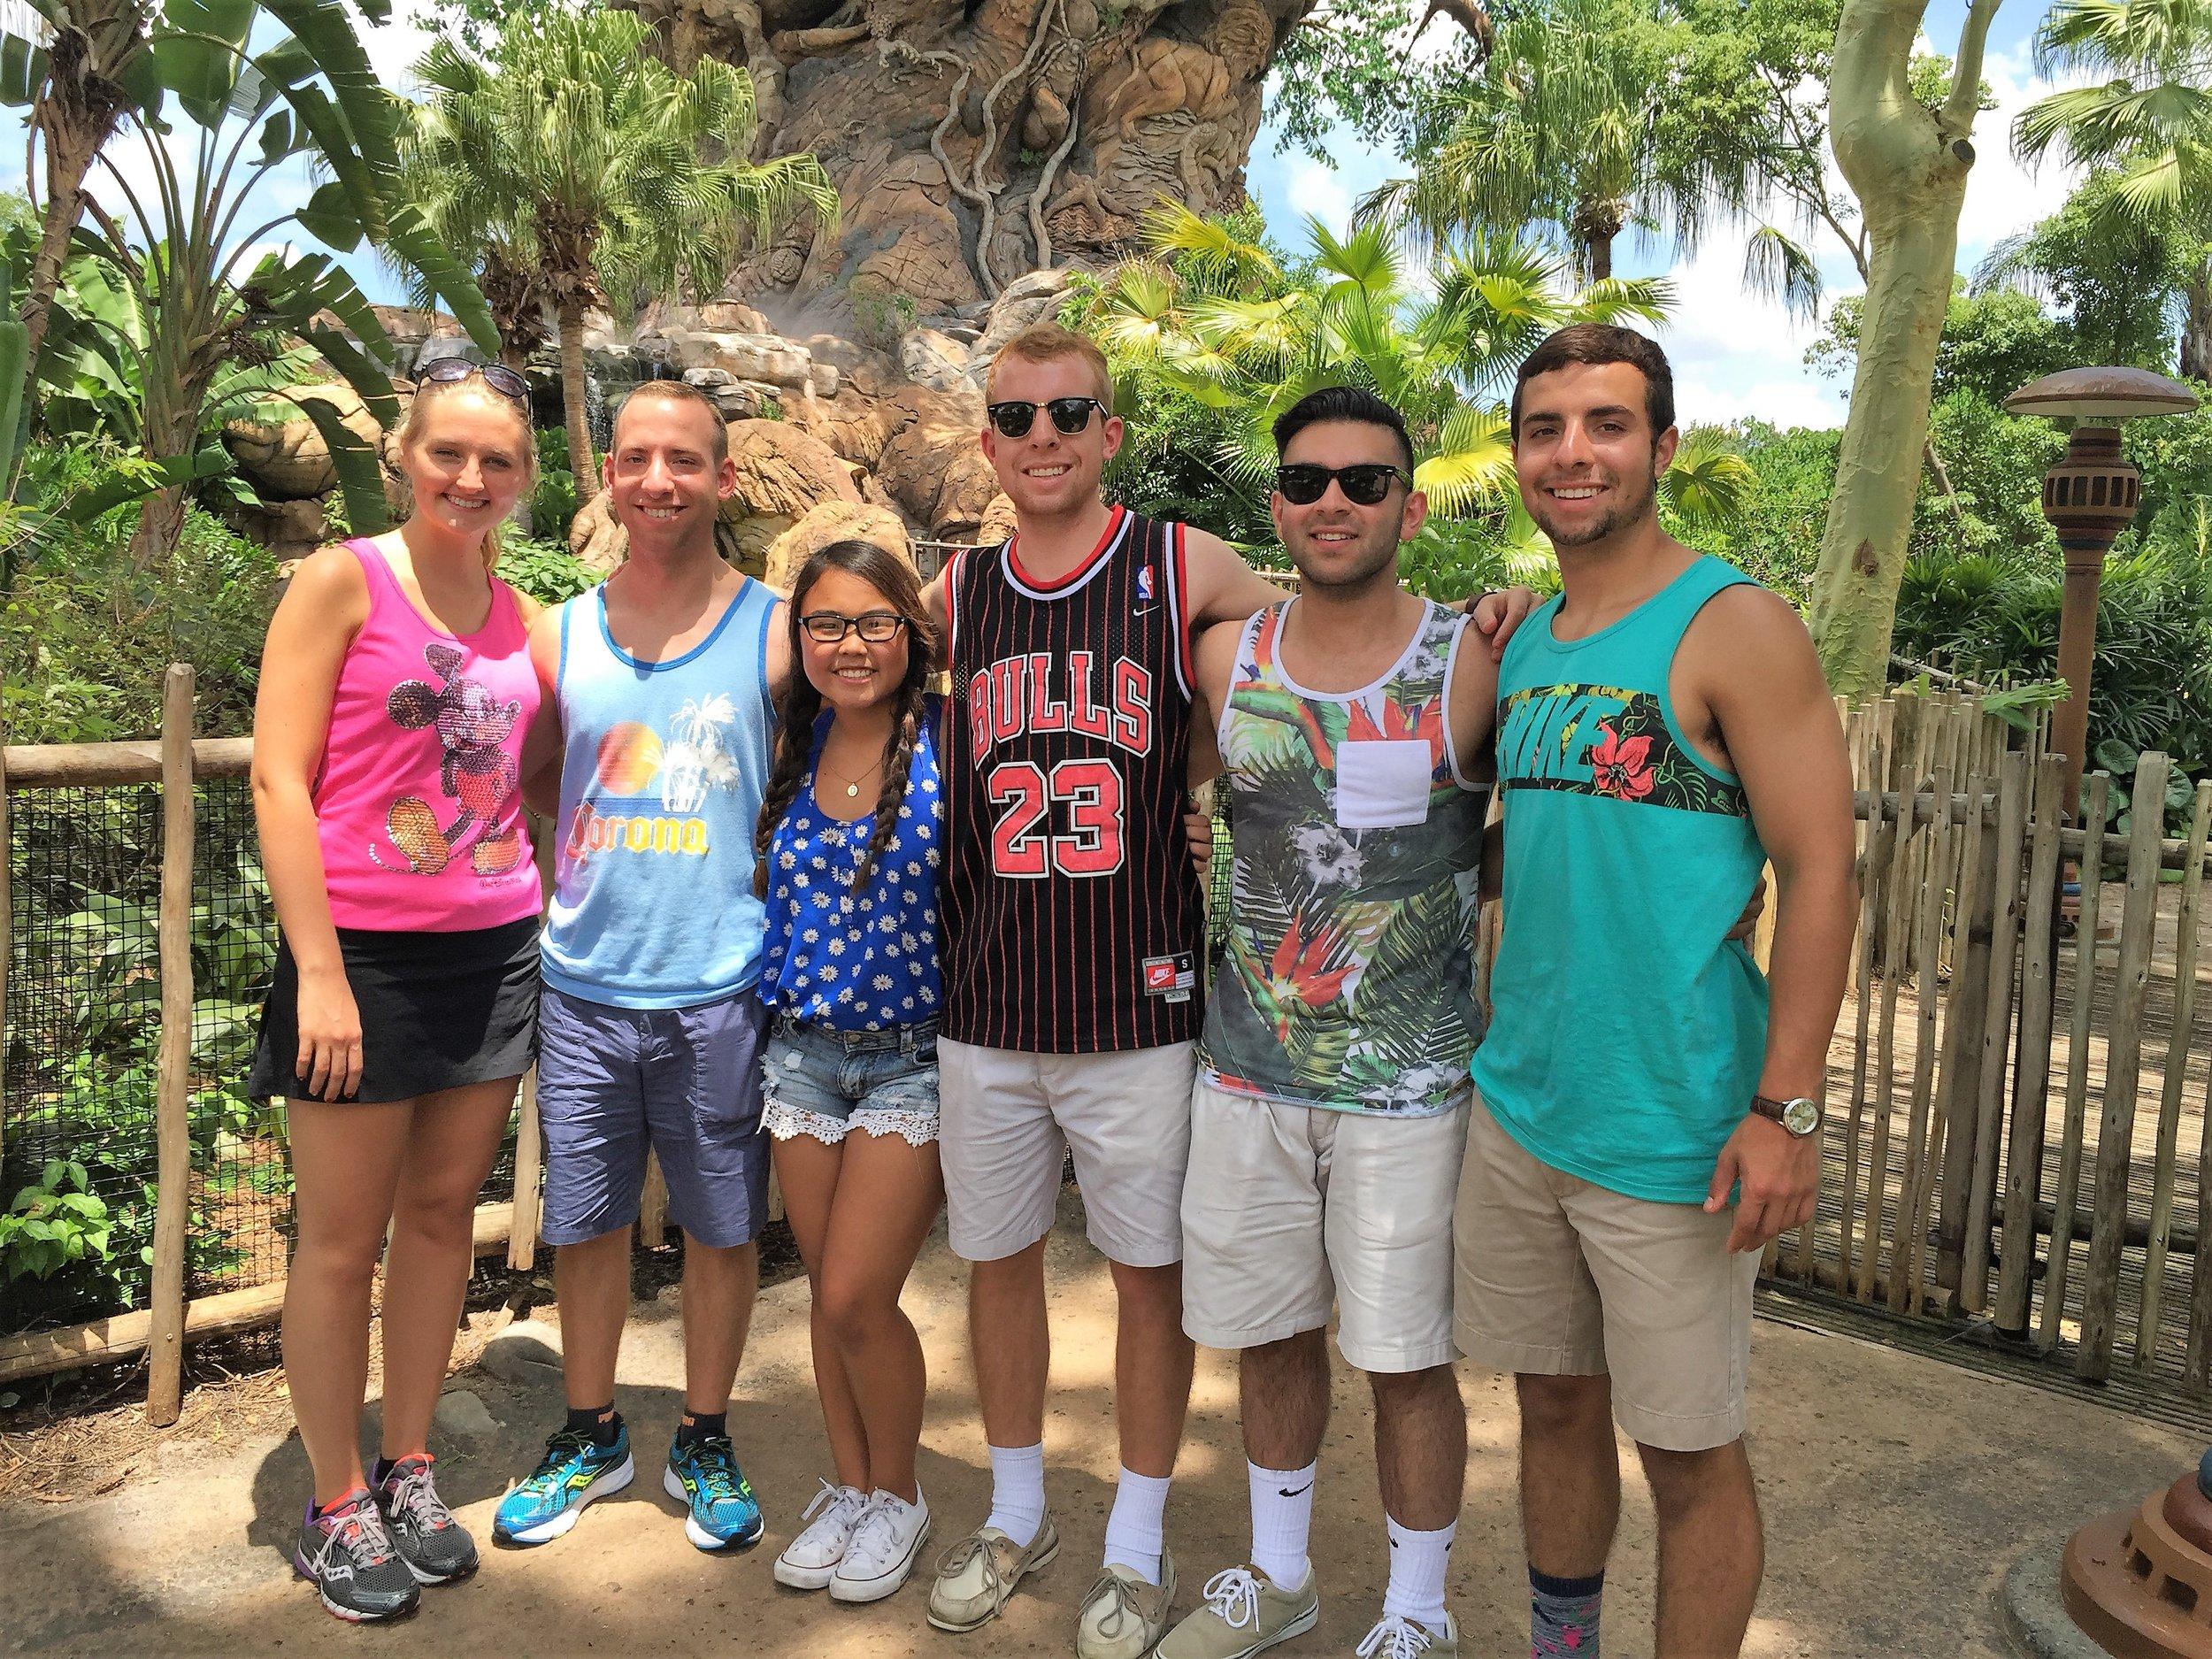 June 23, 2015. Maria, Grant, Laney, Alec, Jhonny and Nick. Nick starting to bulk up.